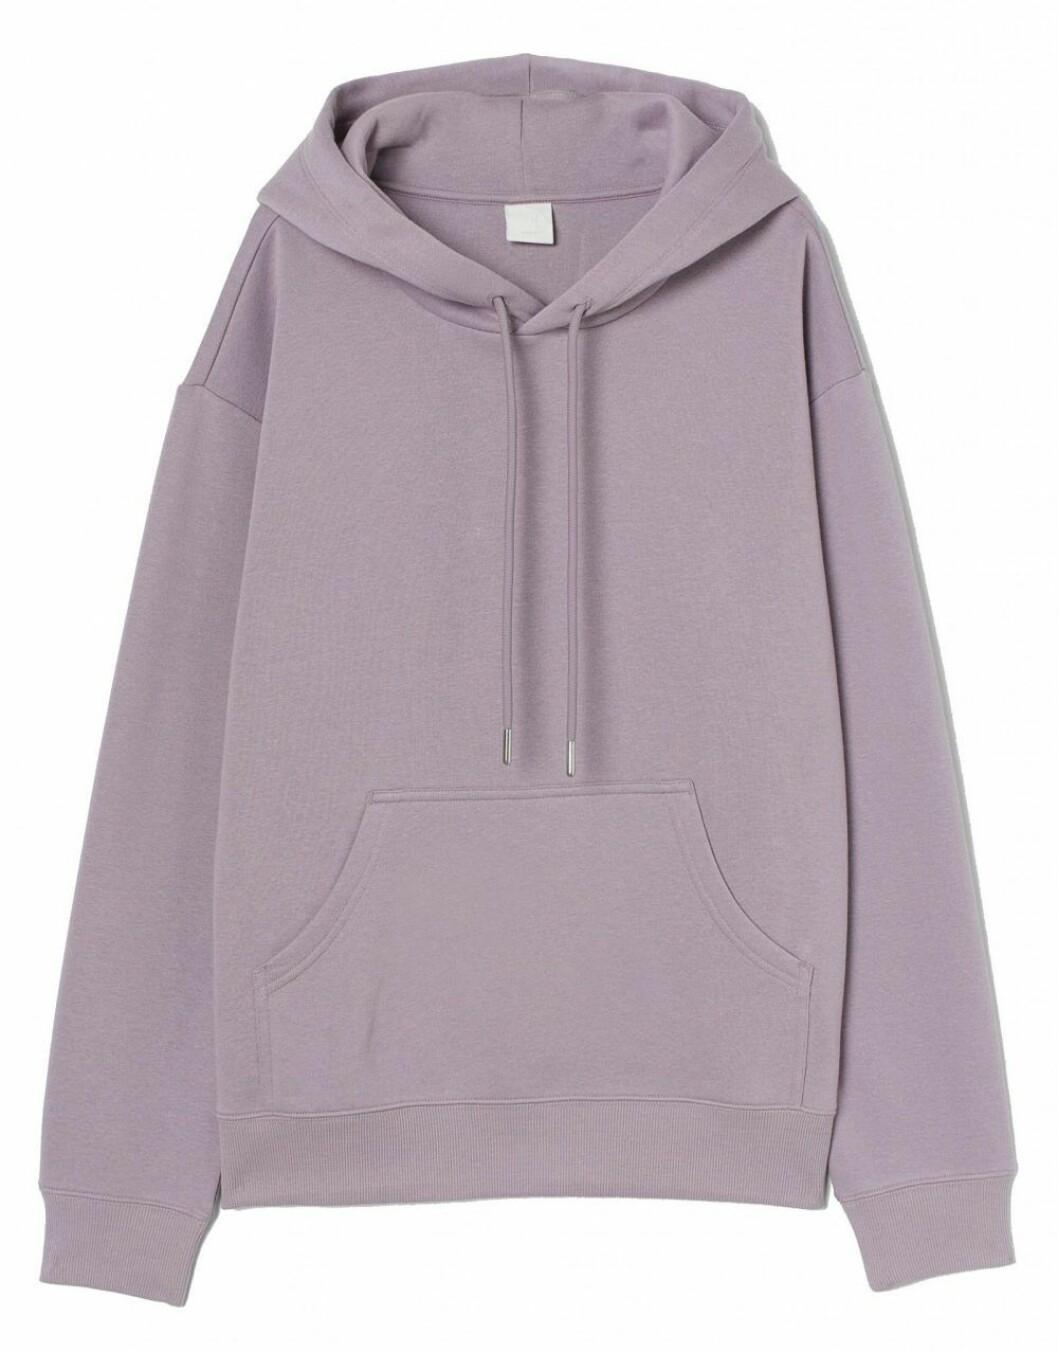 Lila hoodie i oversized modell från H&M.